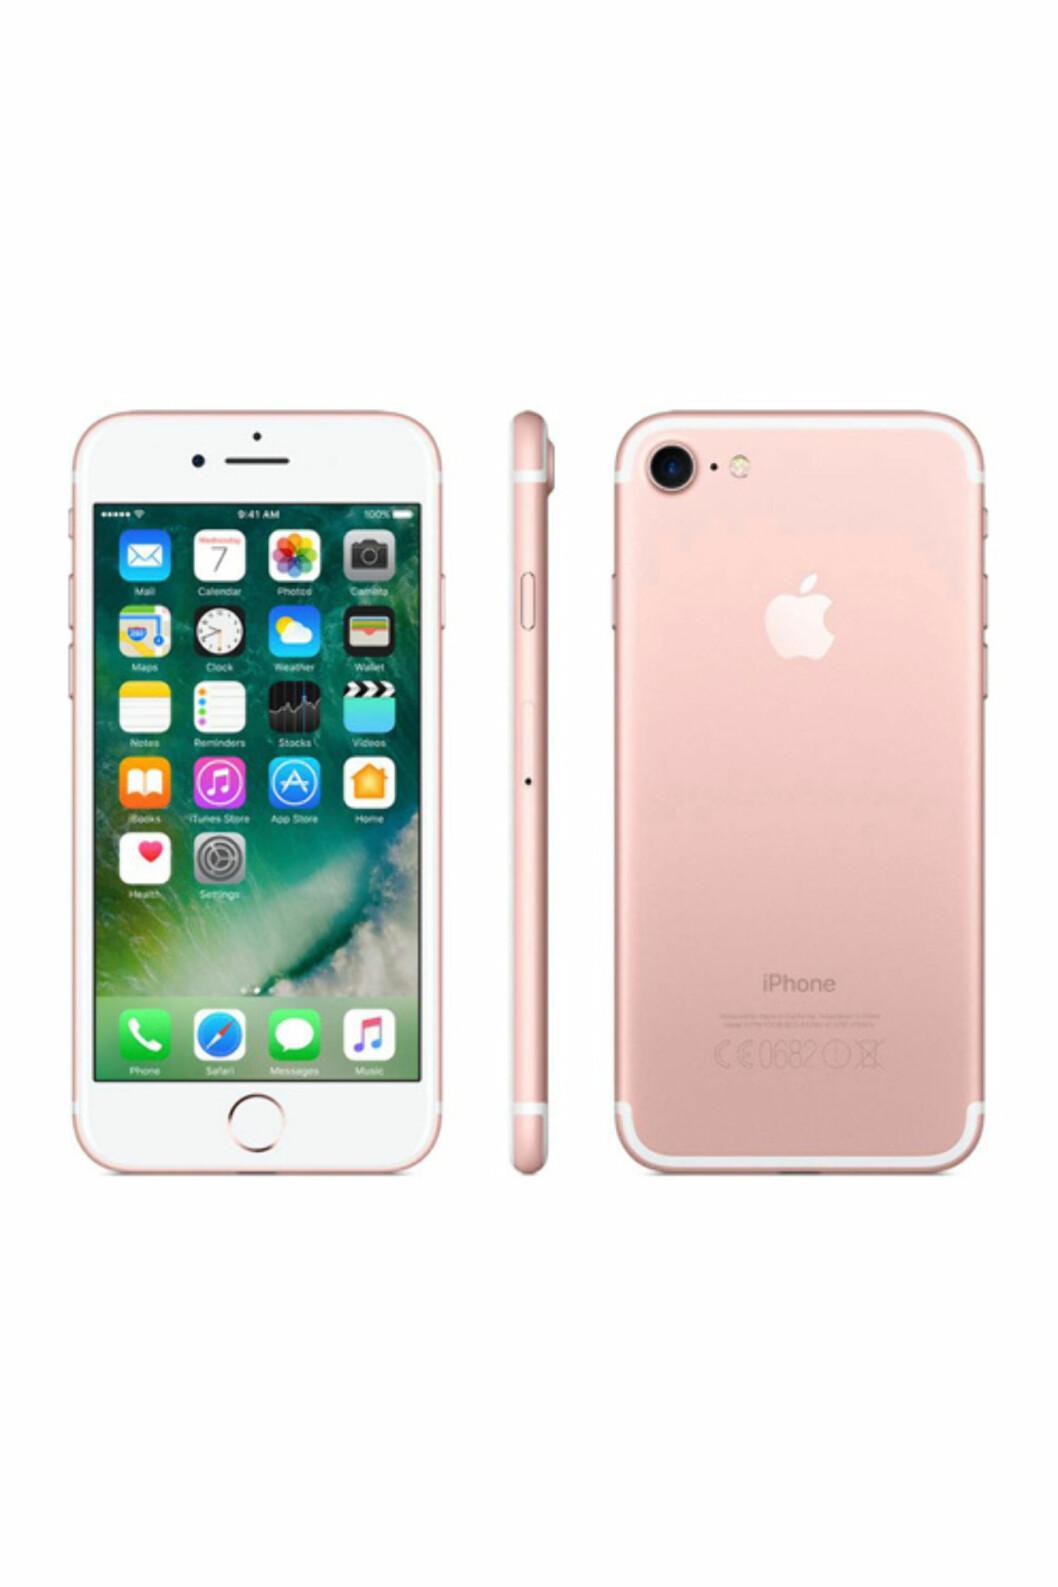 iPhone 7 fra Apple via Ellos.no   kr 8999   https://track.adtraction.com/t/t?a=1068408670&as=1115634940&t=2&tk=1&url=http://www.ellos.no/elektronikk/mobiltelefoni/smartphones/iphone?intcmp=EN_1647_ellostab_elektronik_splash_spot1_iphone7&pid=559840